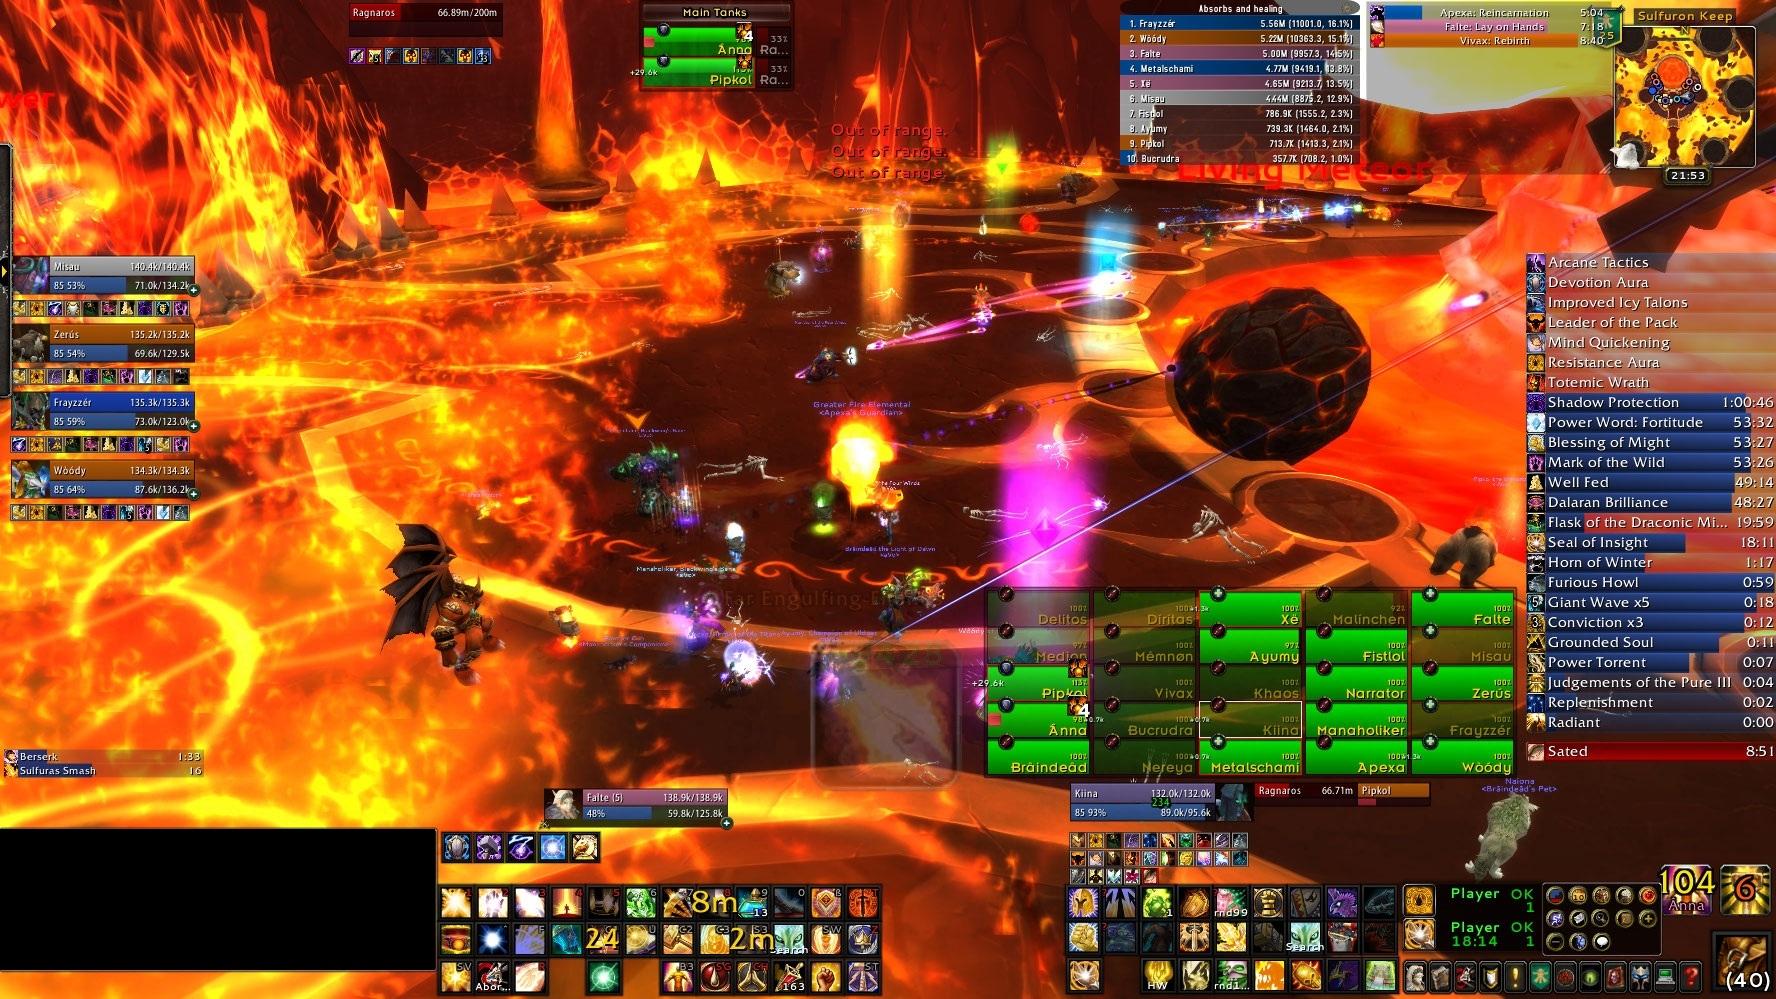 Falte's Raiding UI 1920x1080 : Healer Compilations : World of Warcraft AddOns